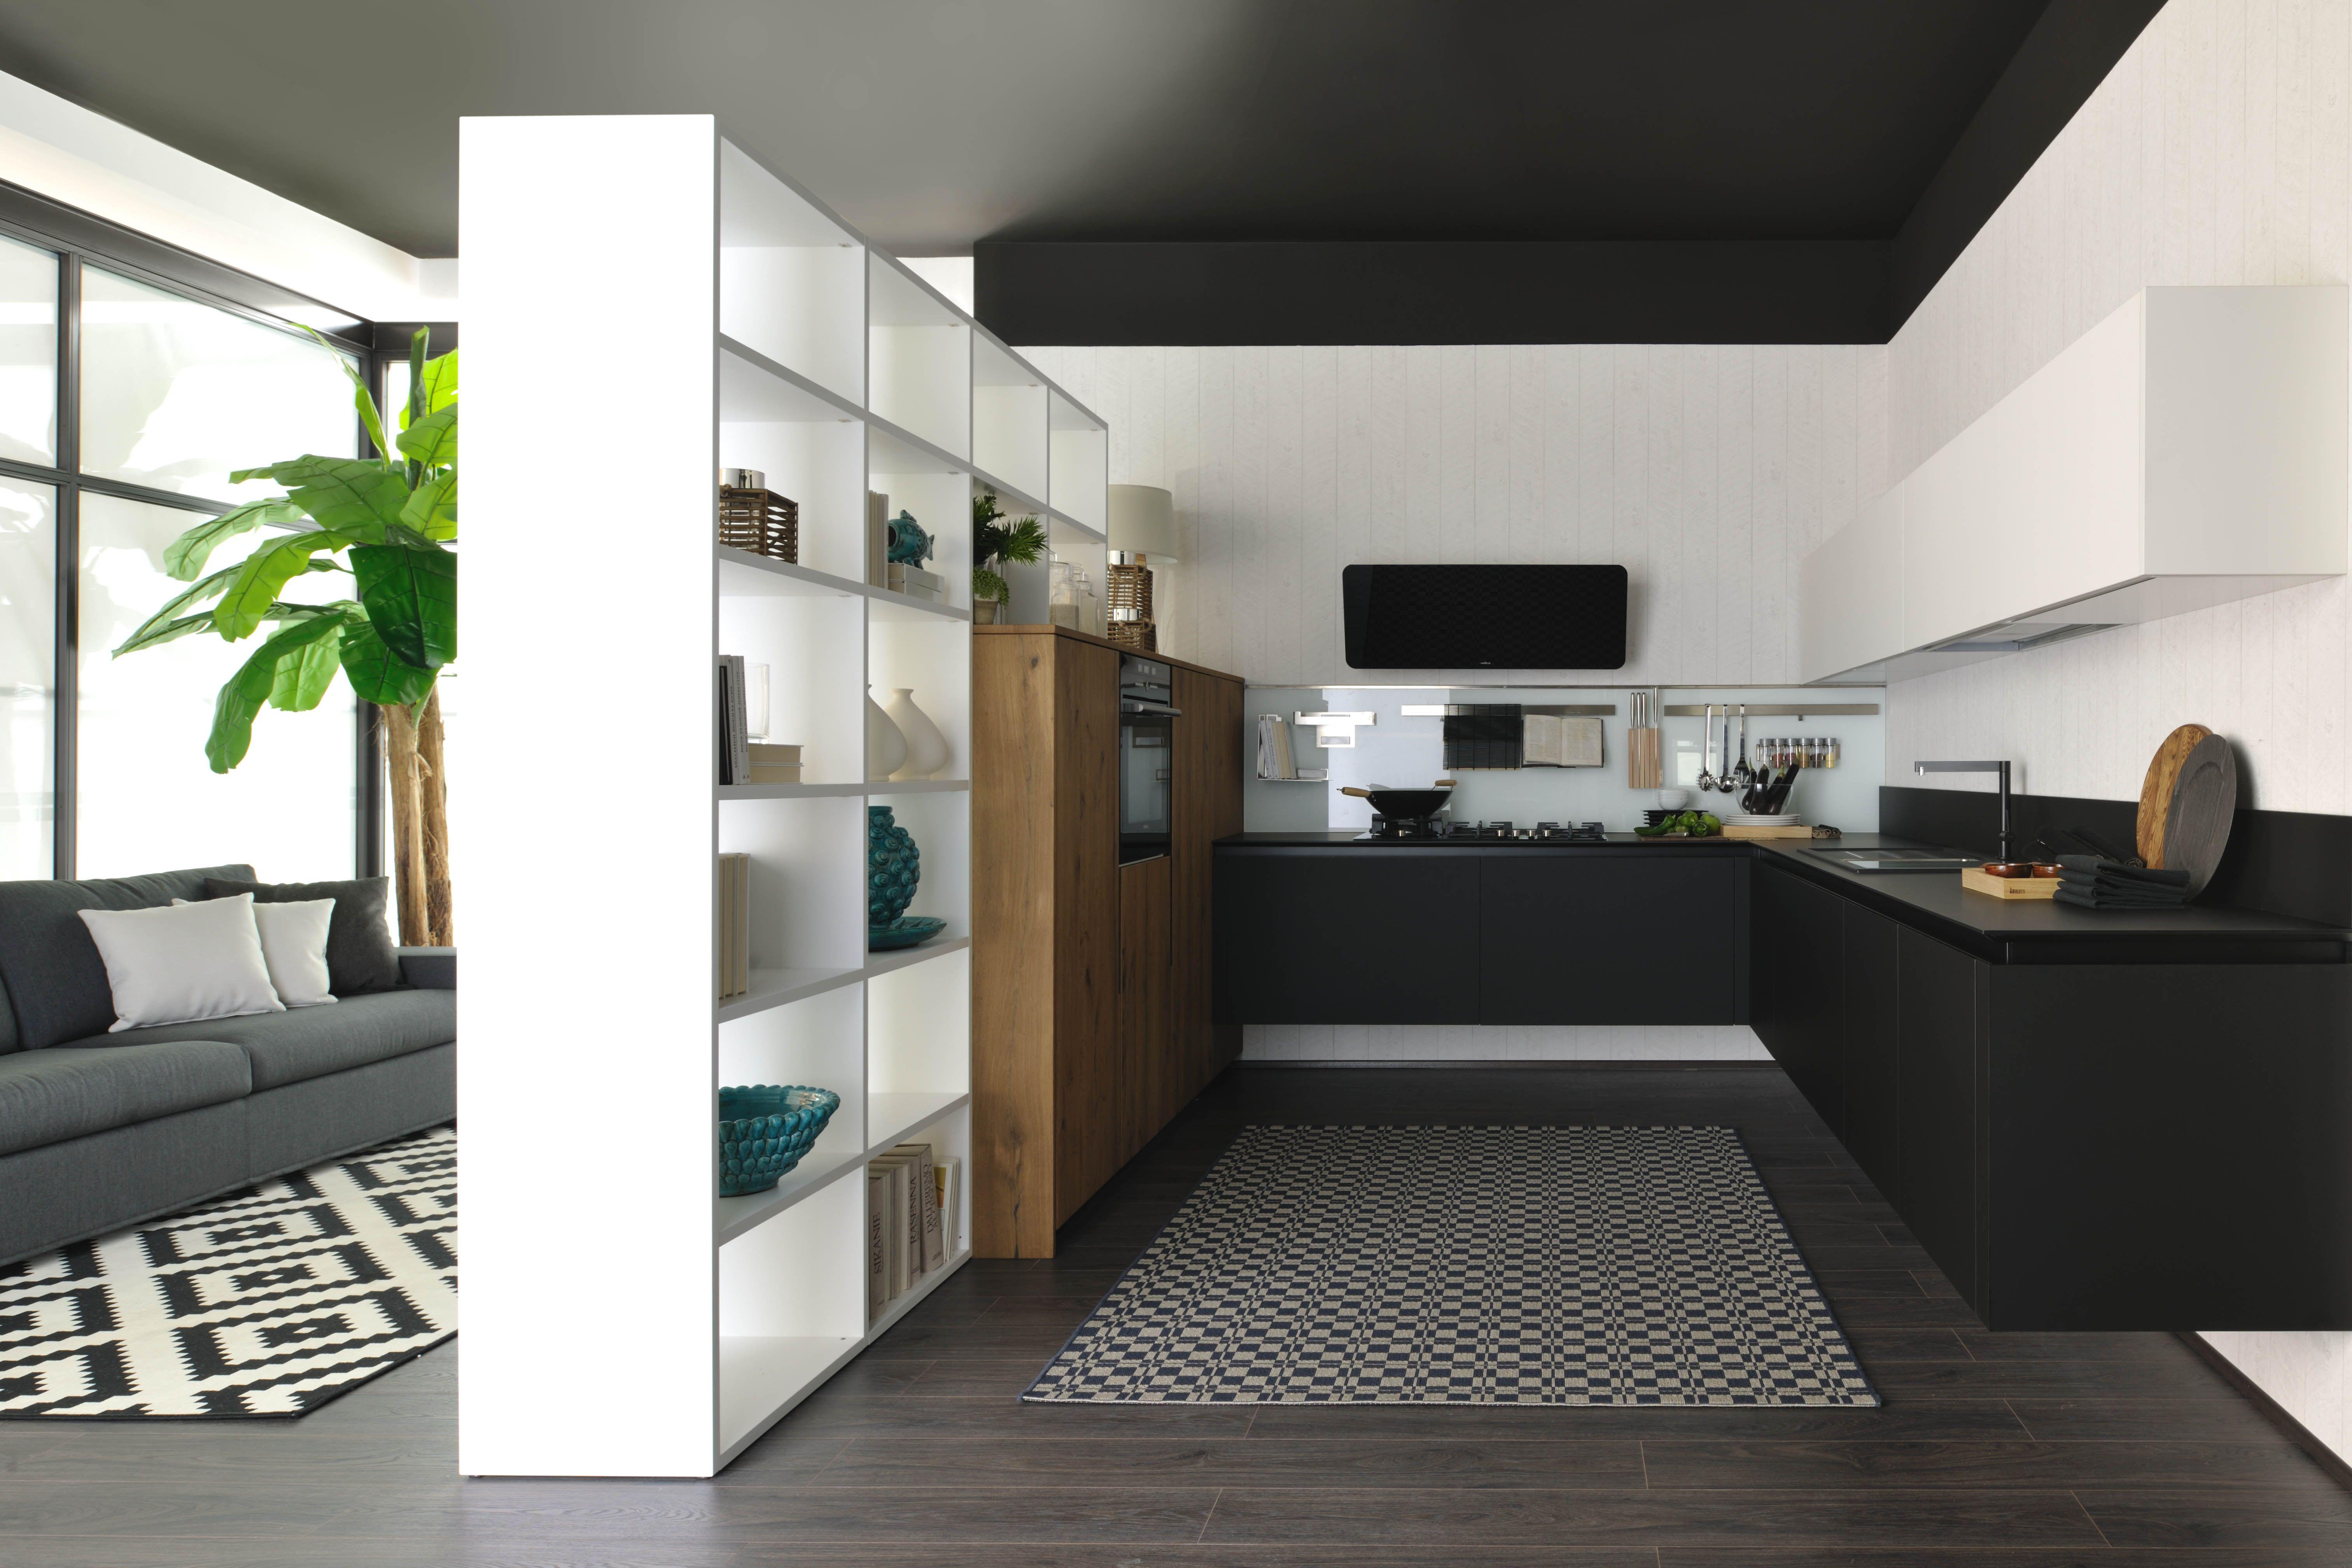 Oltre, the new kitchen concept by Cucine Lube. FENIX NTM Nero Ingo ...